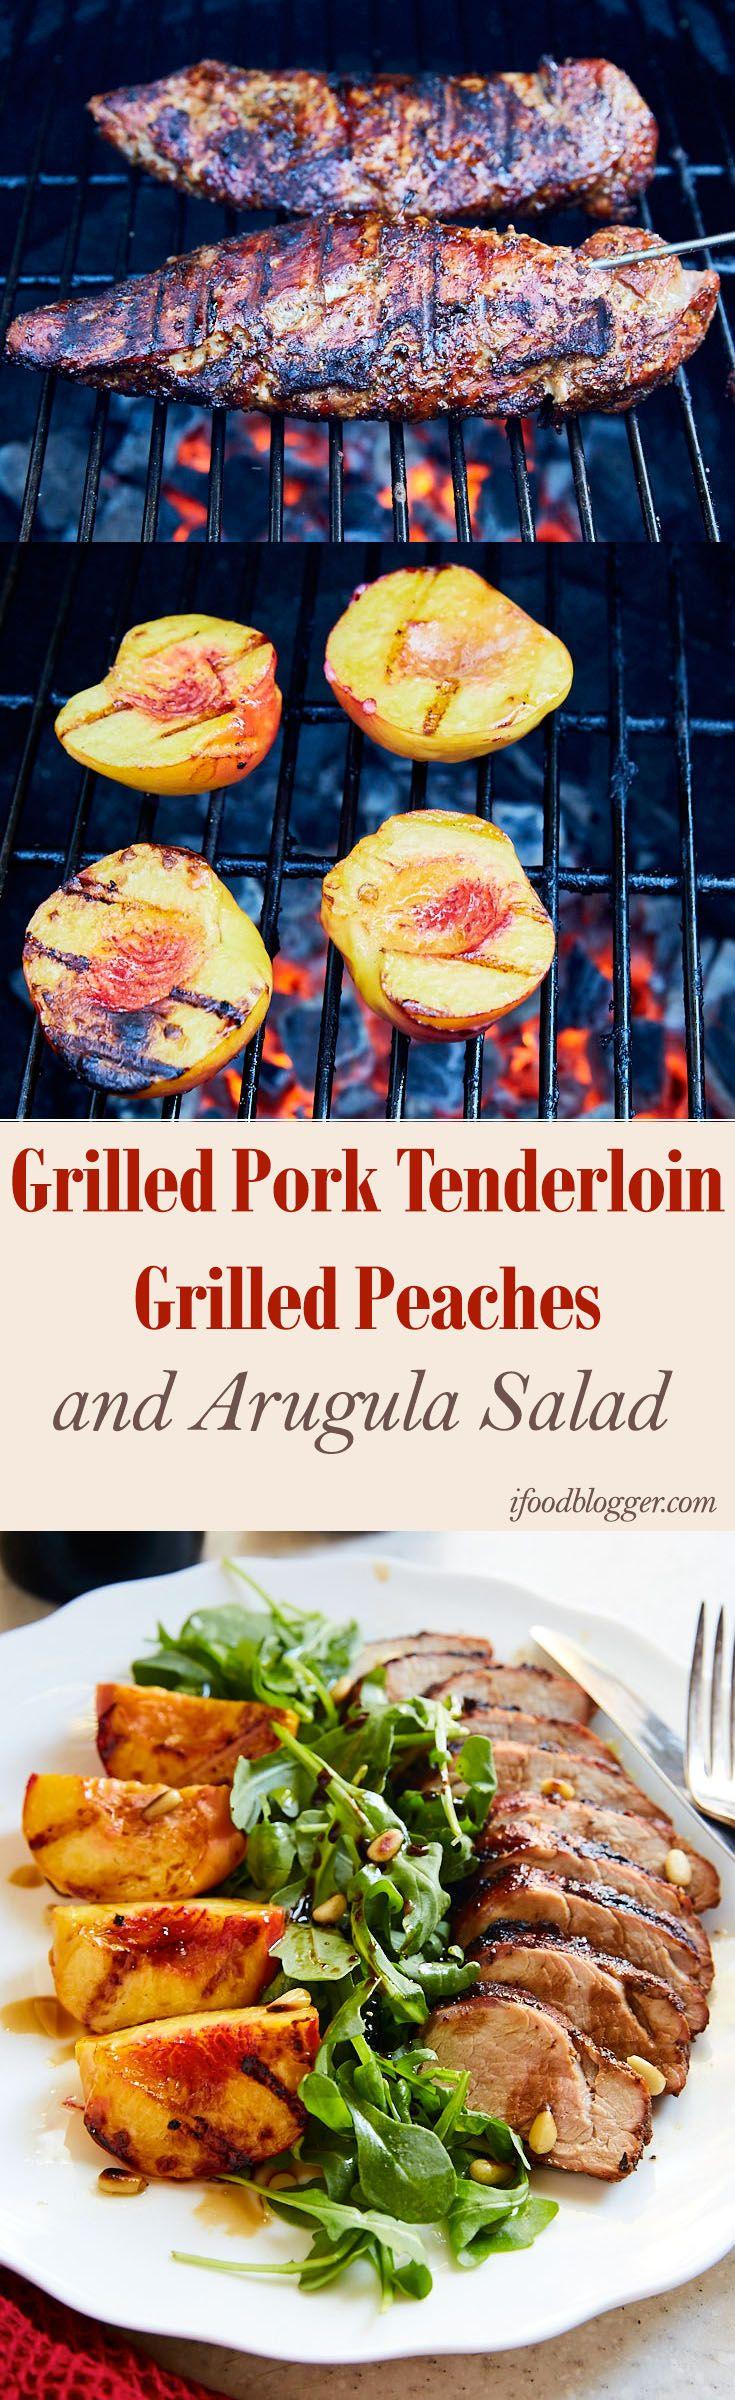 Grilled Pork Tenderloin, Peach and Arugula Salad                                                                                                                                                                                 More